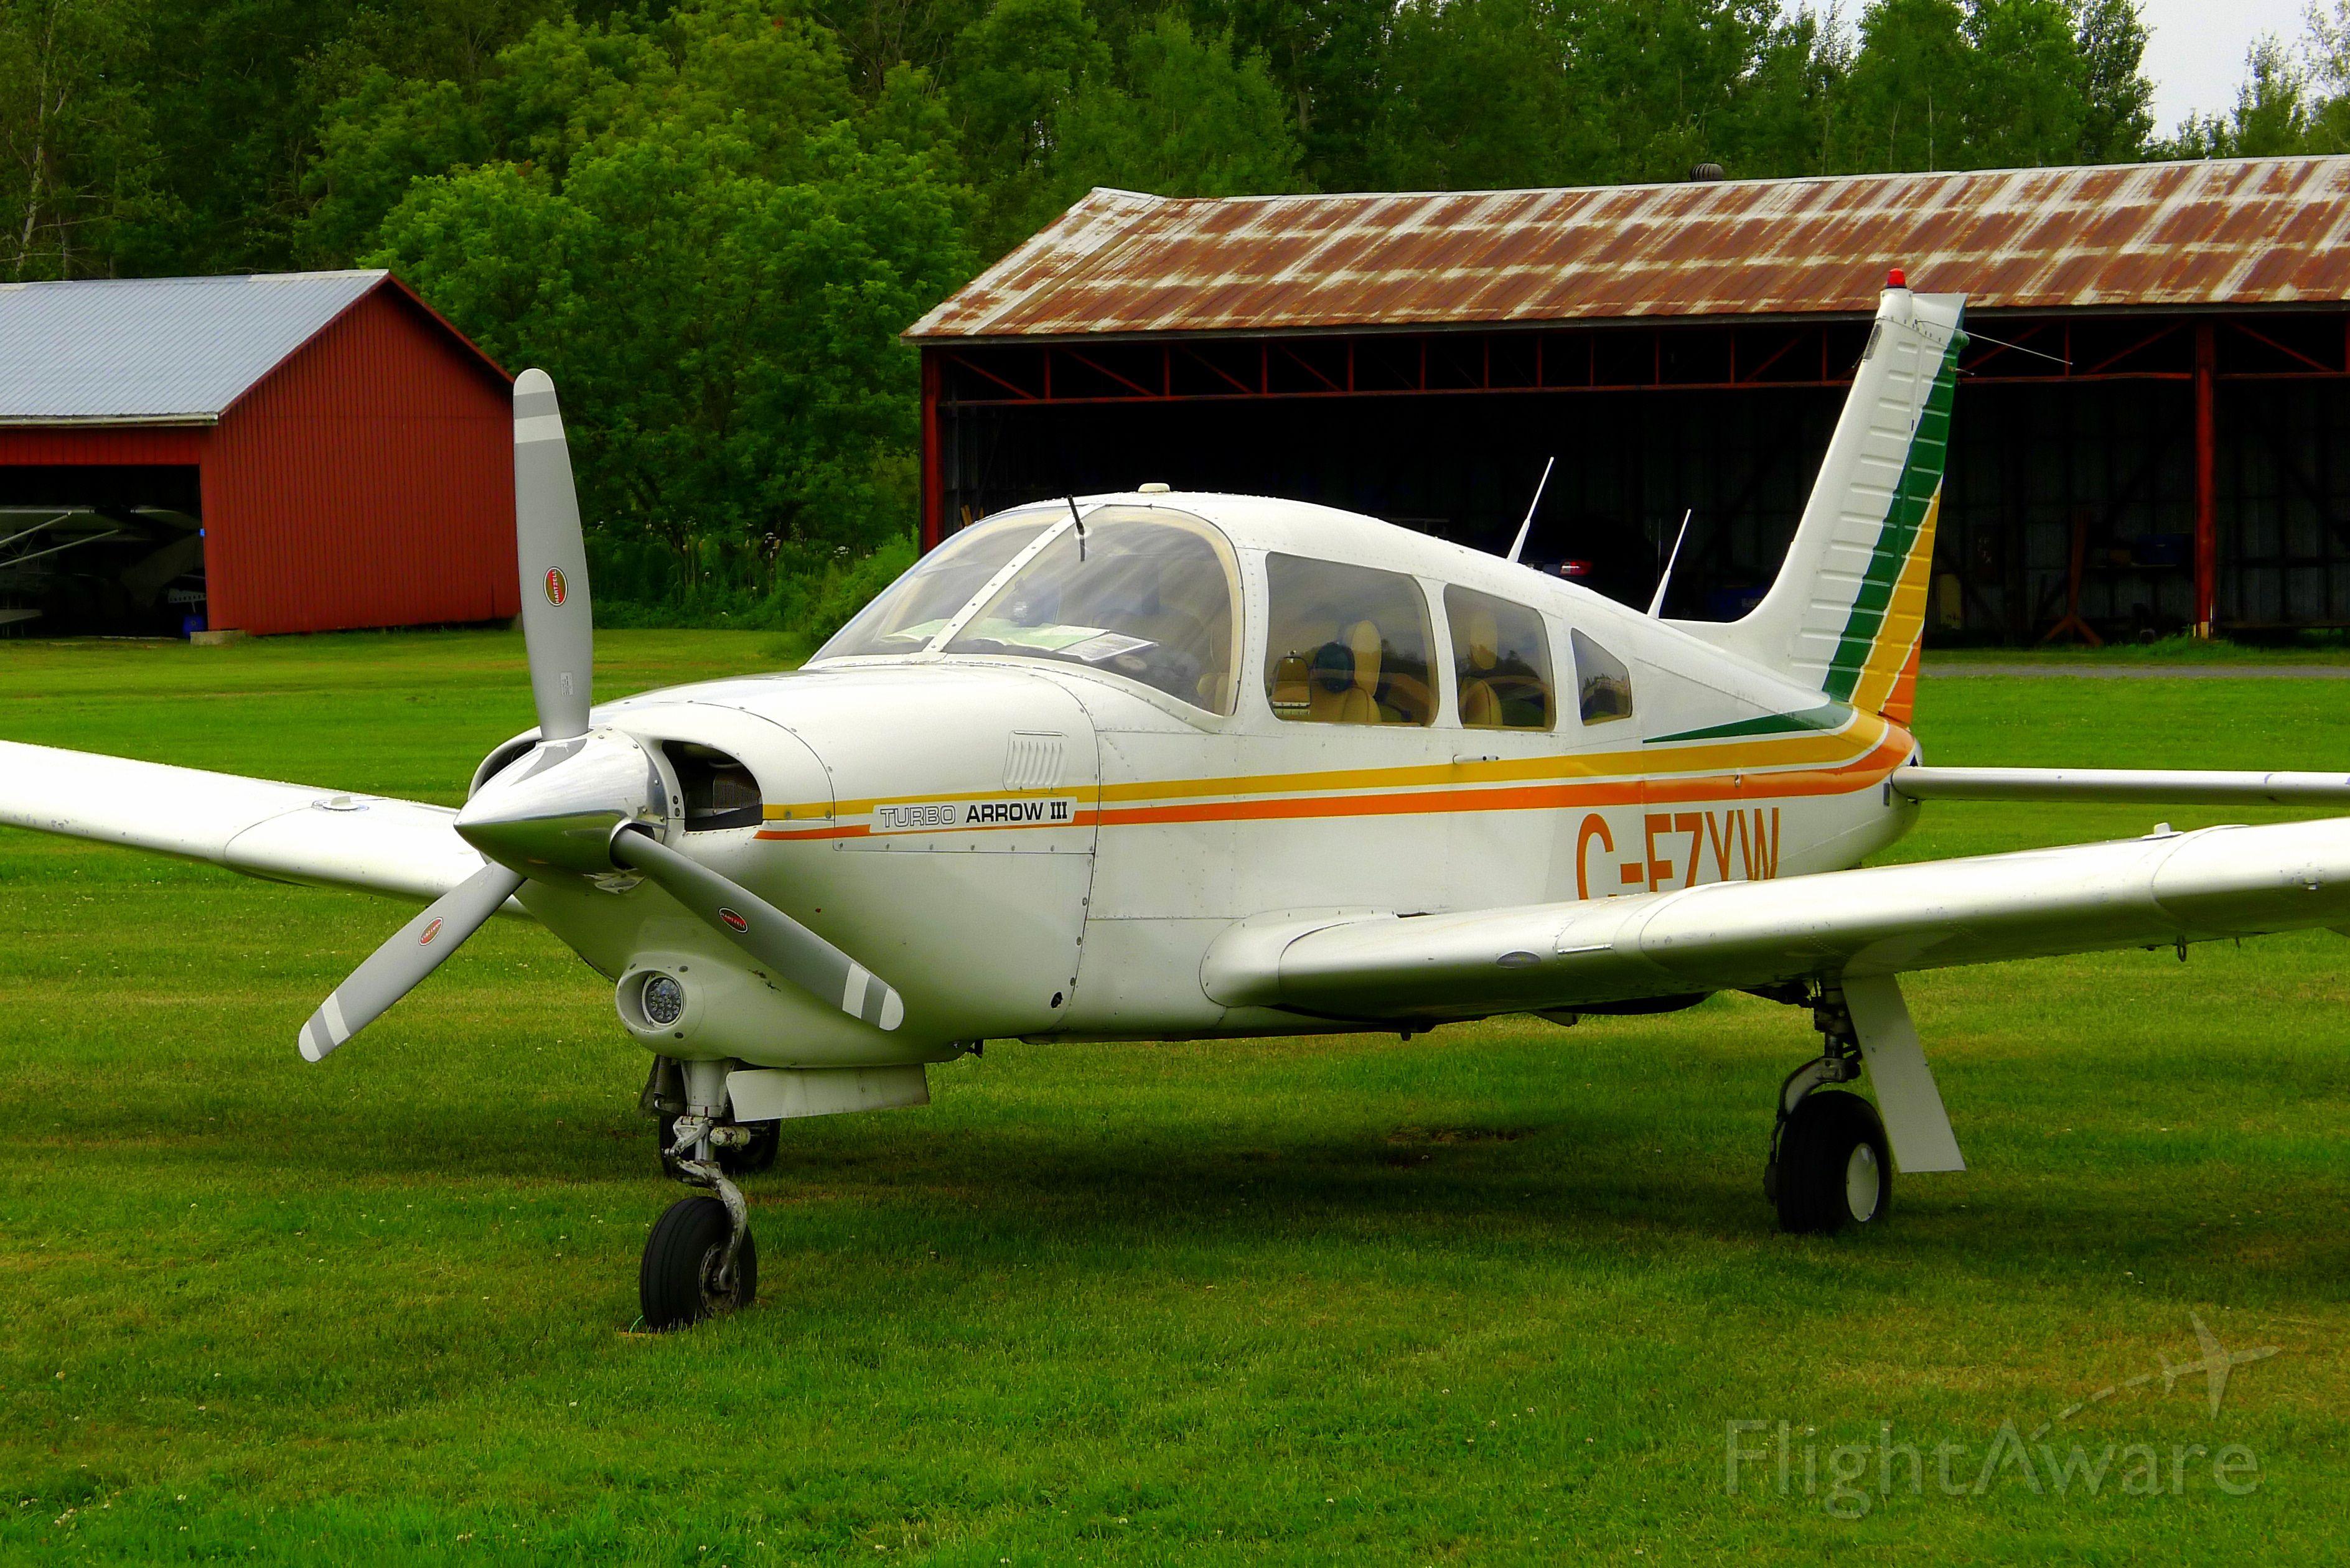 Piper Cherokee (C-FZYW) - C-FZYW at St-Lazare Airport